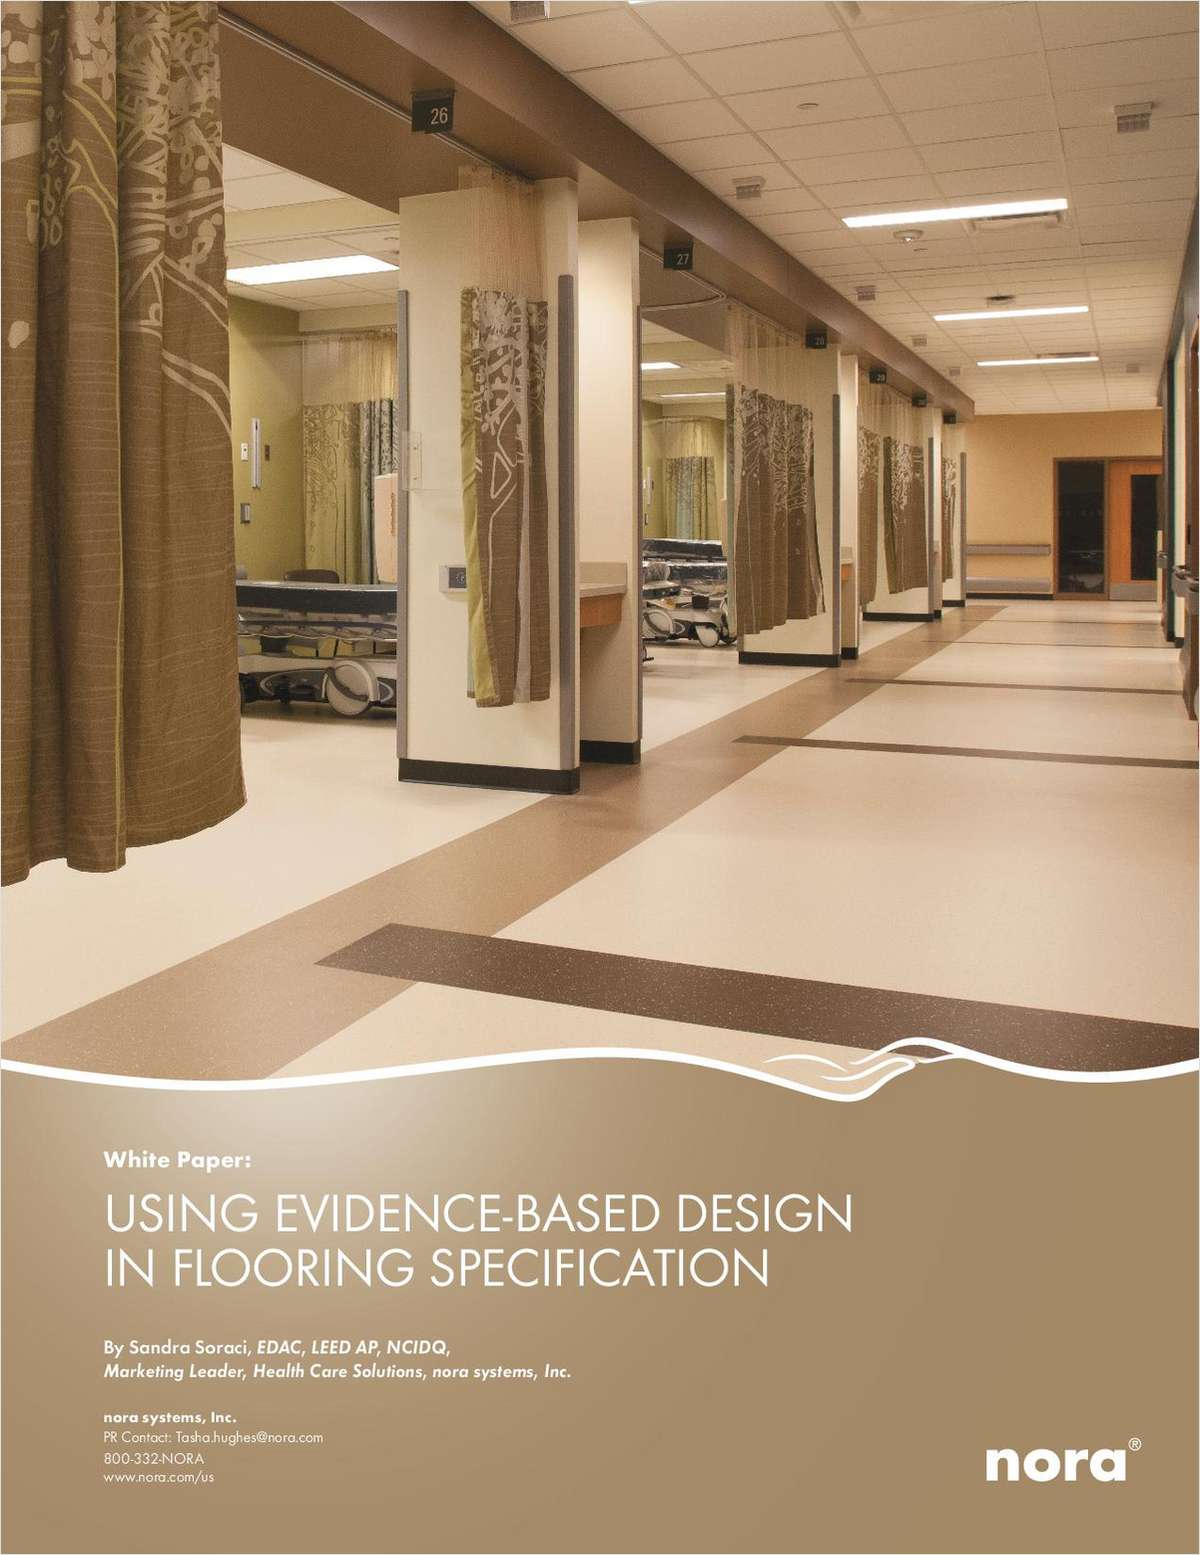 Using Evidence-Based Design in Flooring Specification